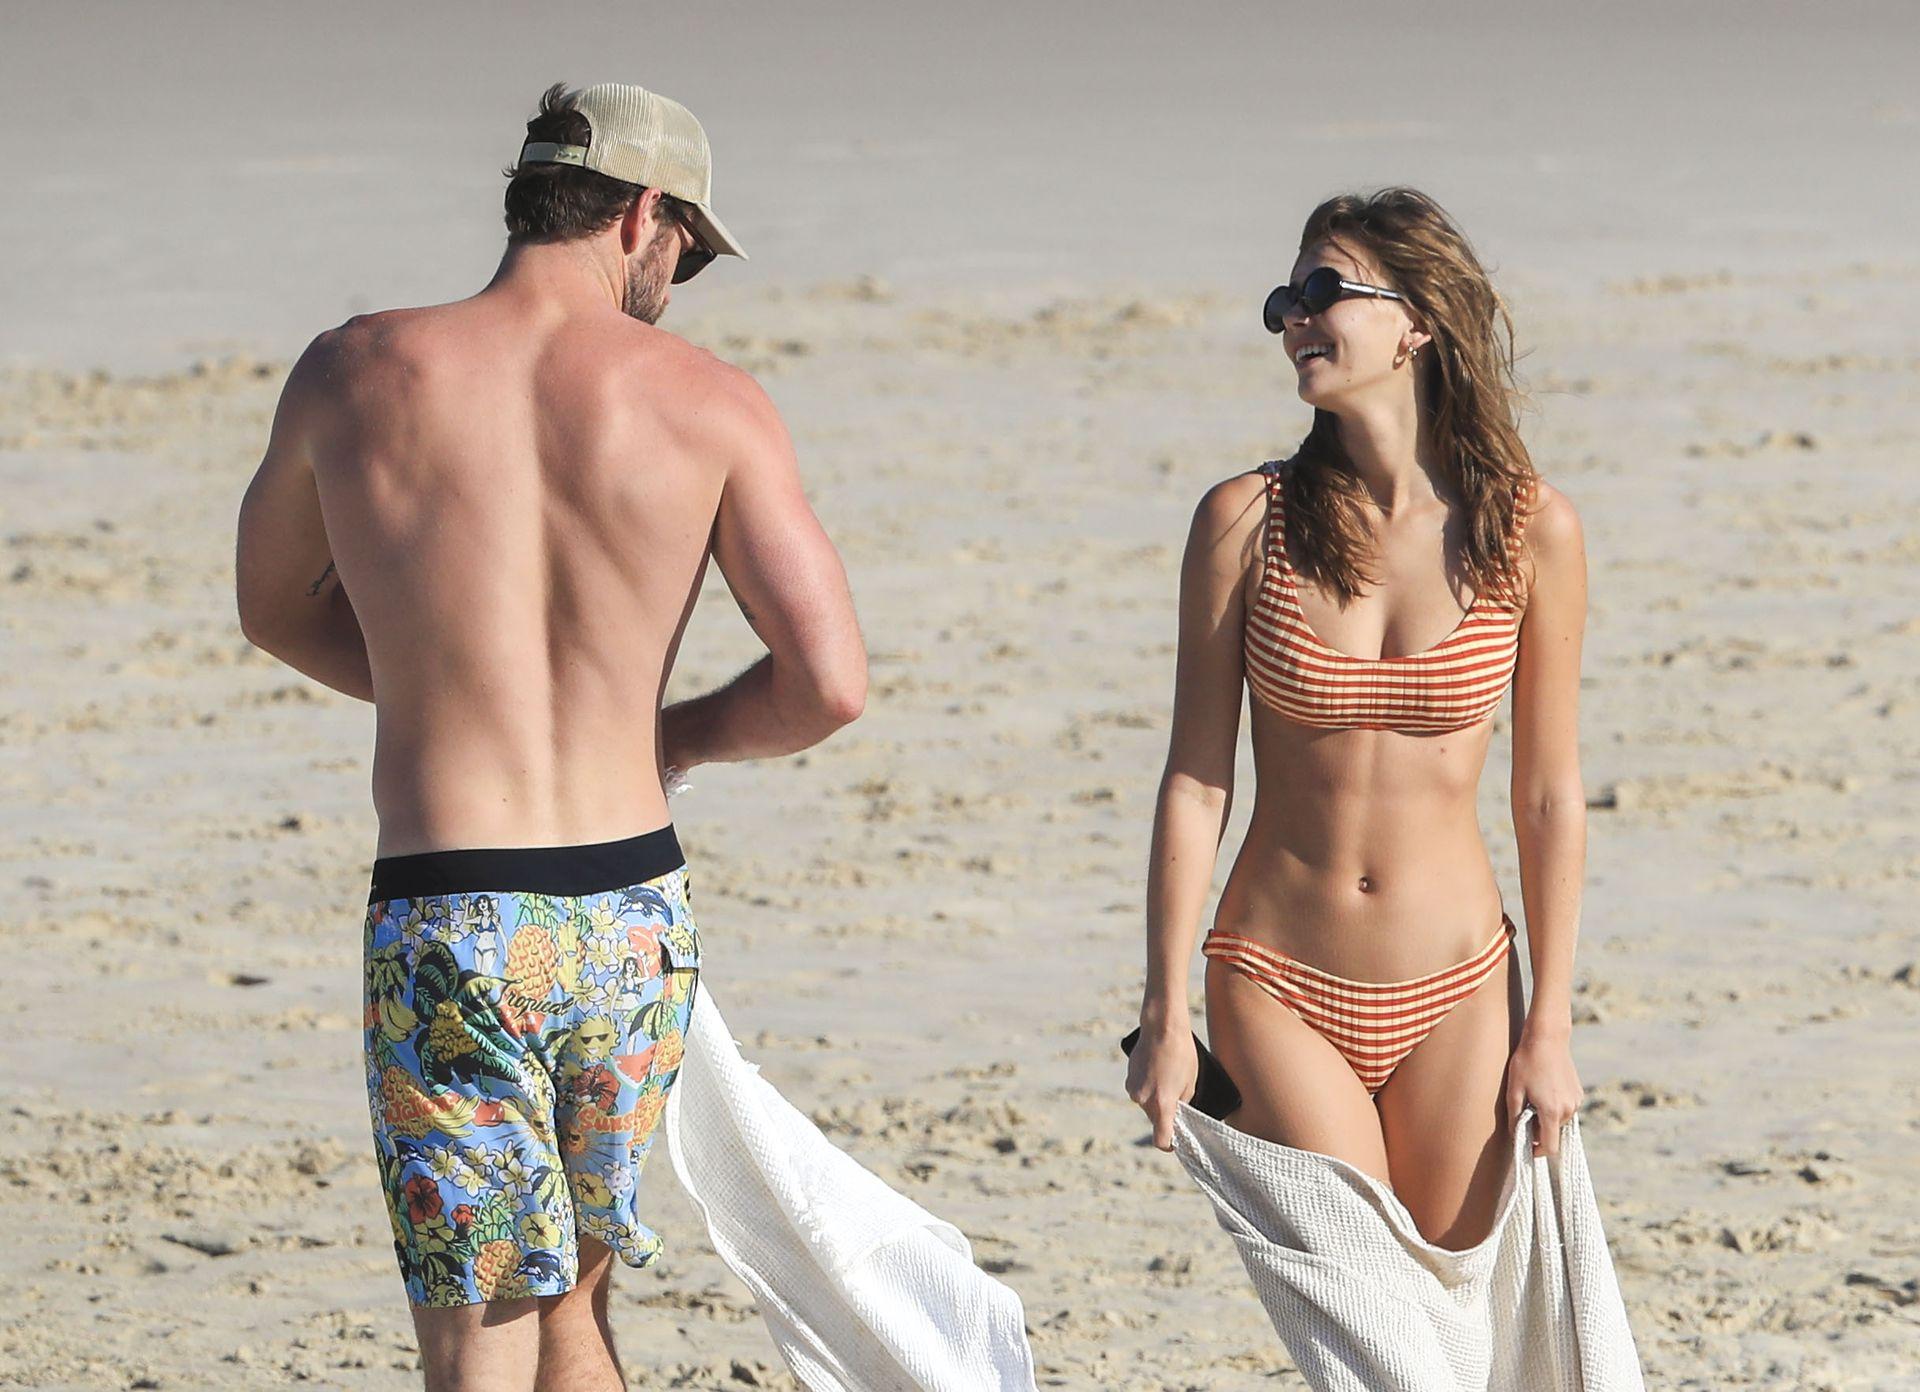 Gabriella Brooks Hot – Liam Hemsworth's New Girlfriend 0053